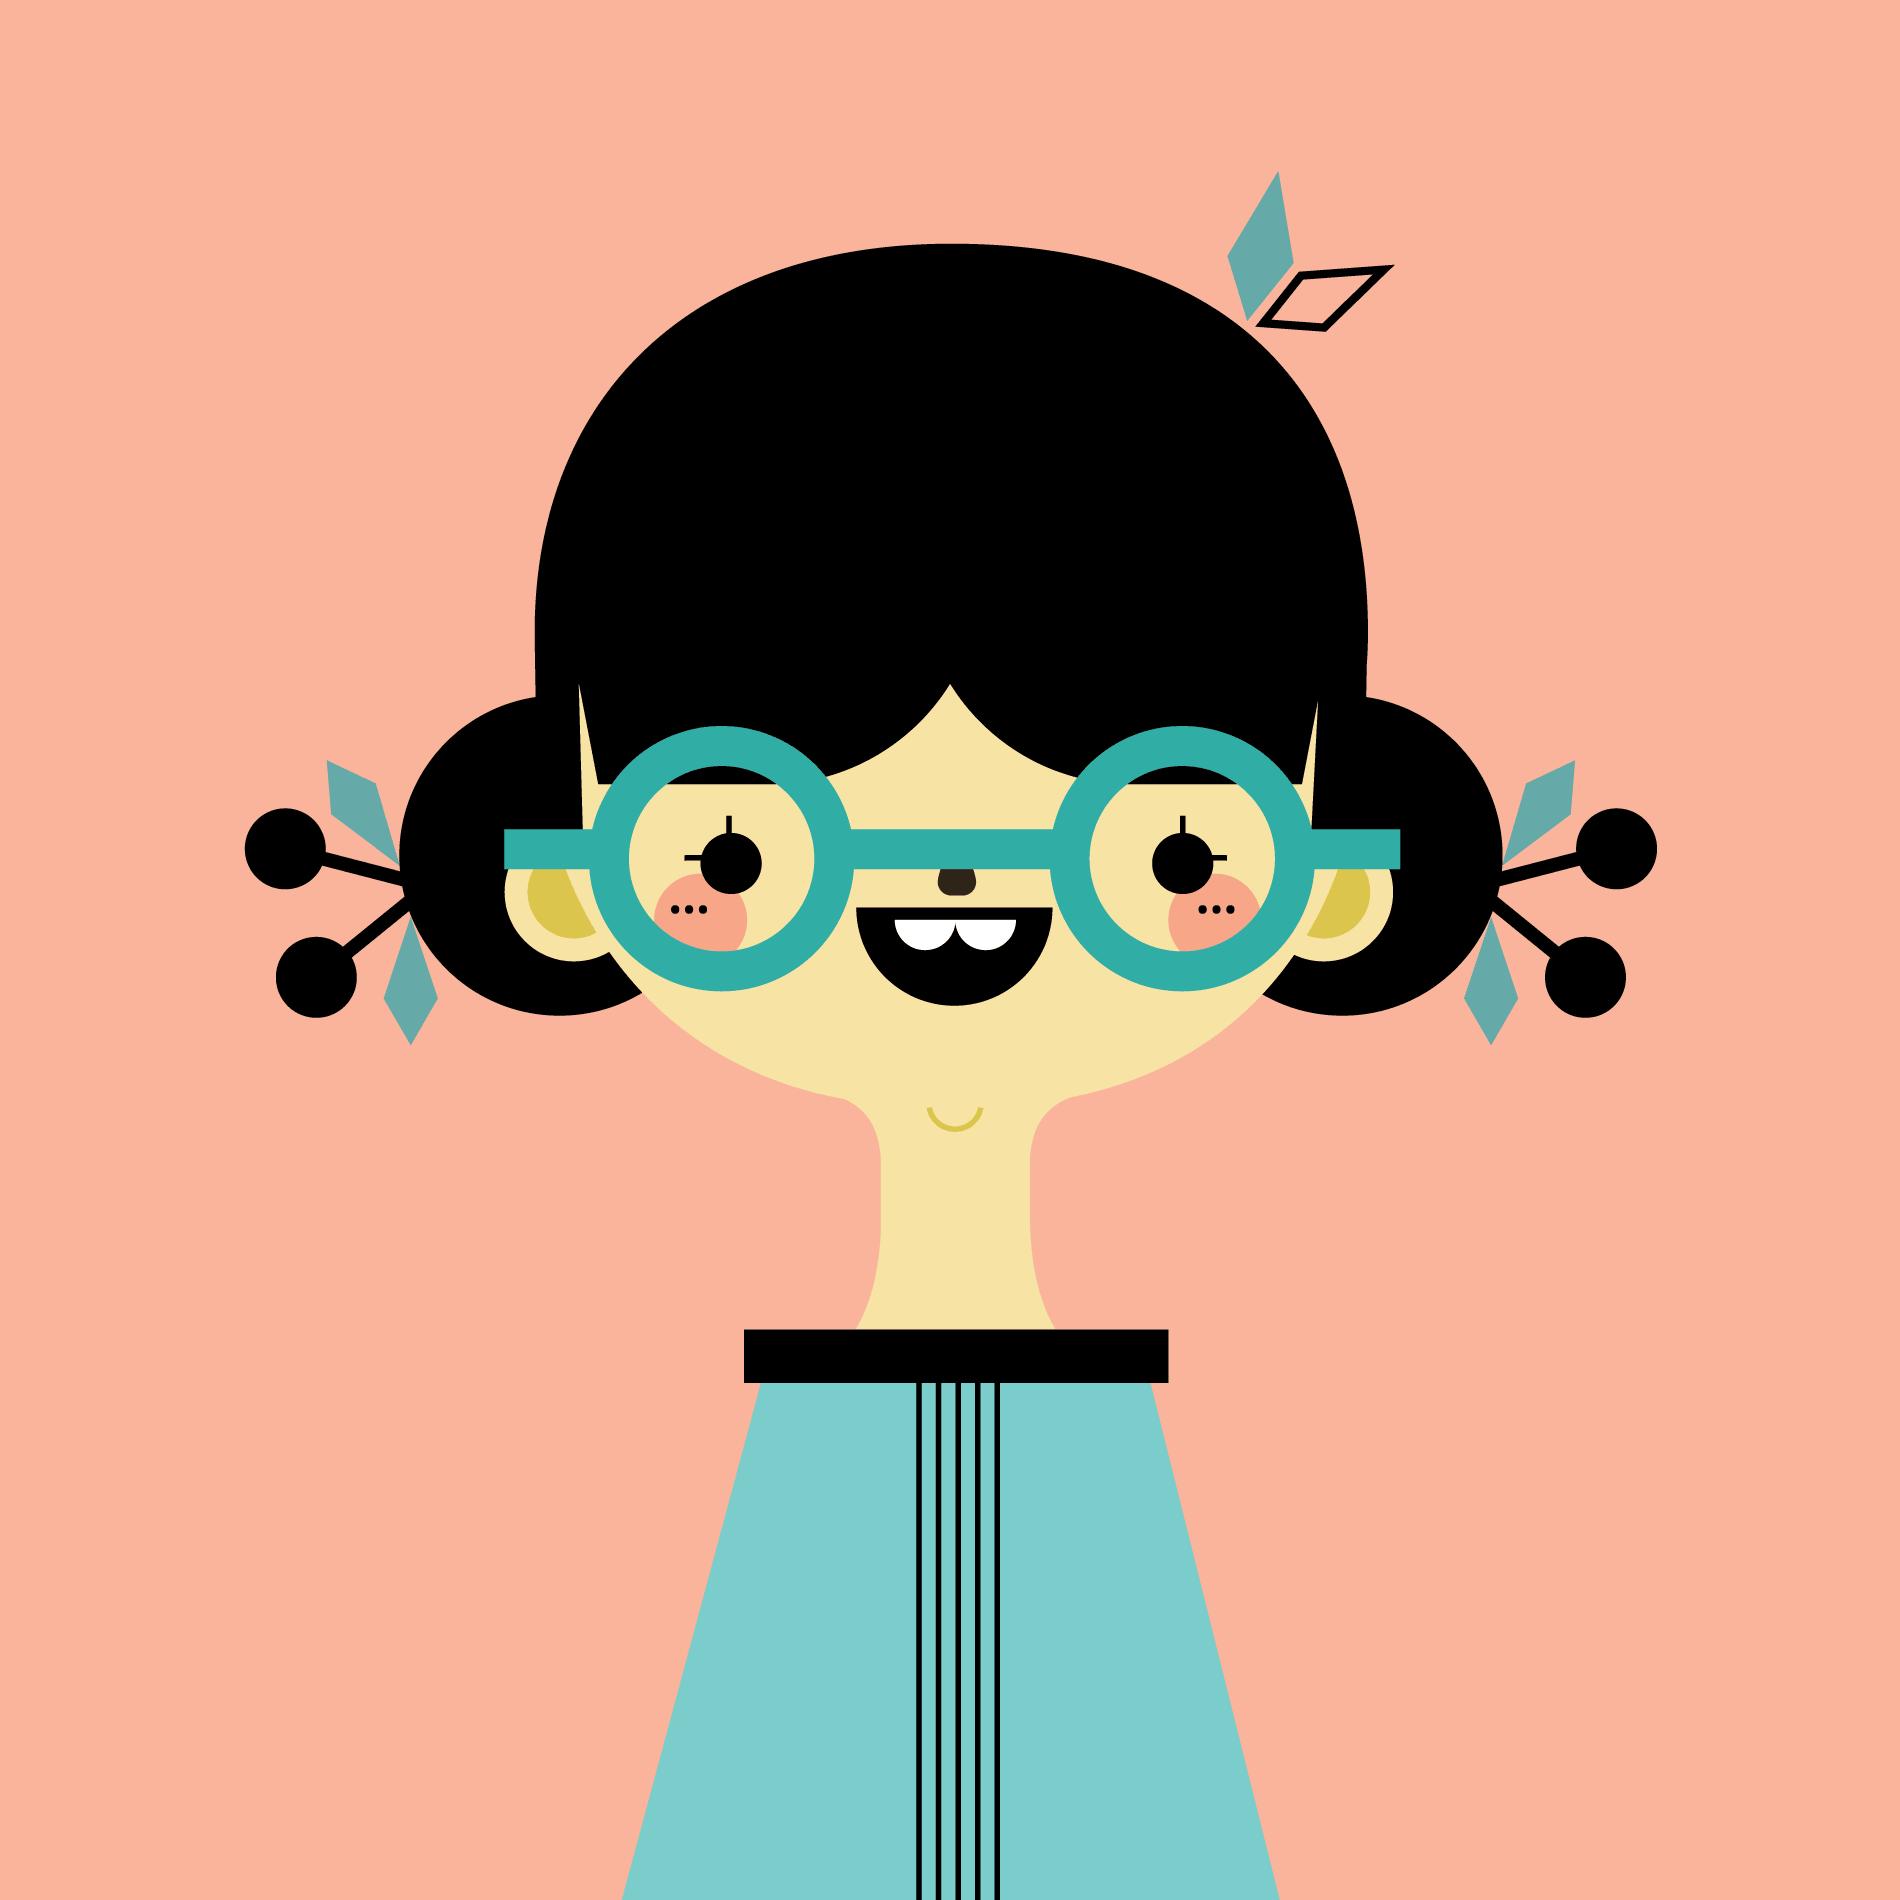 Illustration_pikodori_girl_sm